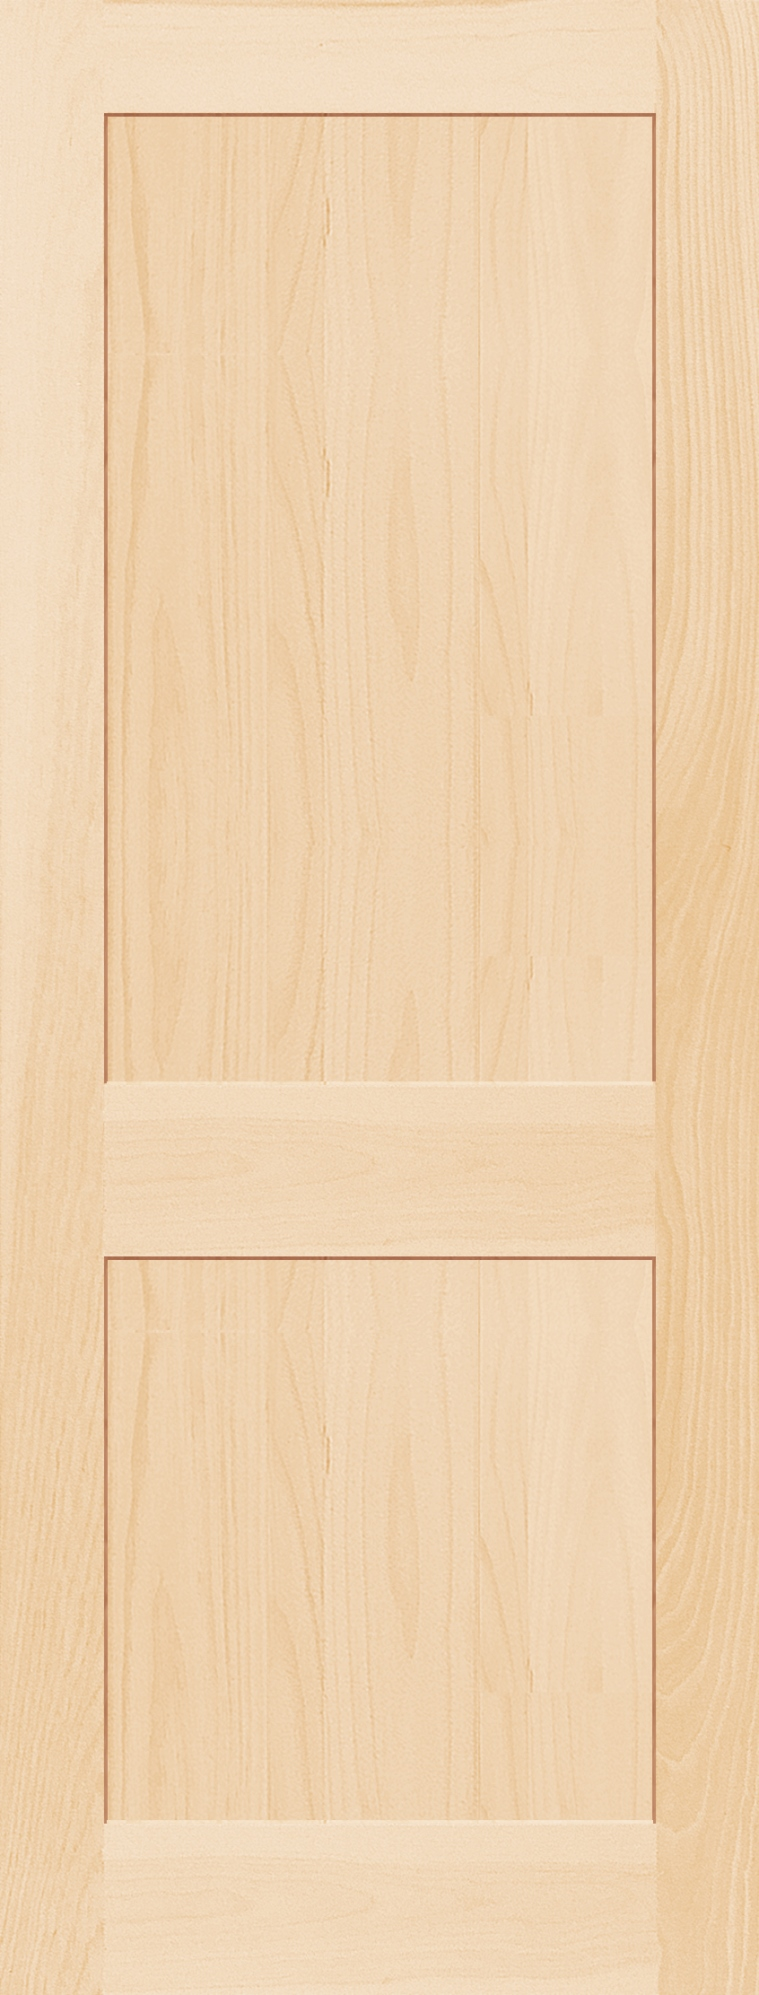 Shaker Doorsmith Proud Canadian Manufacturer Of